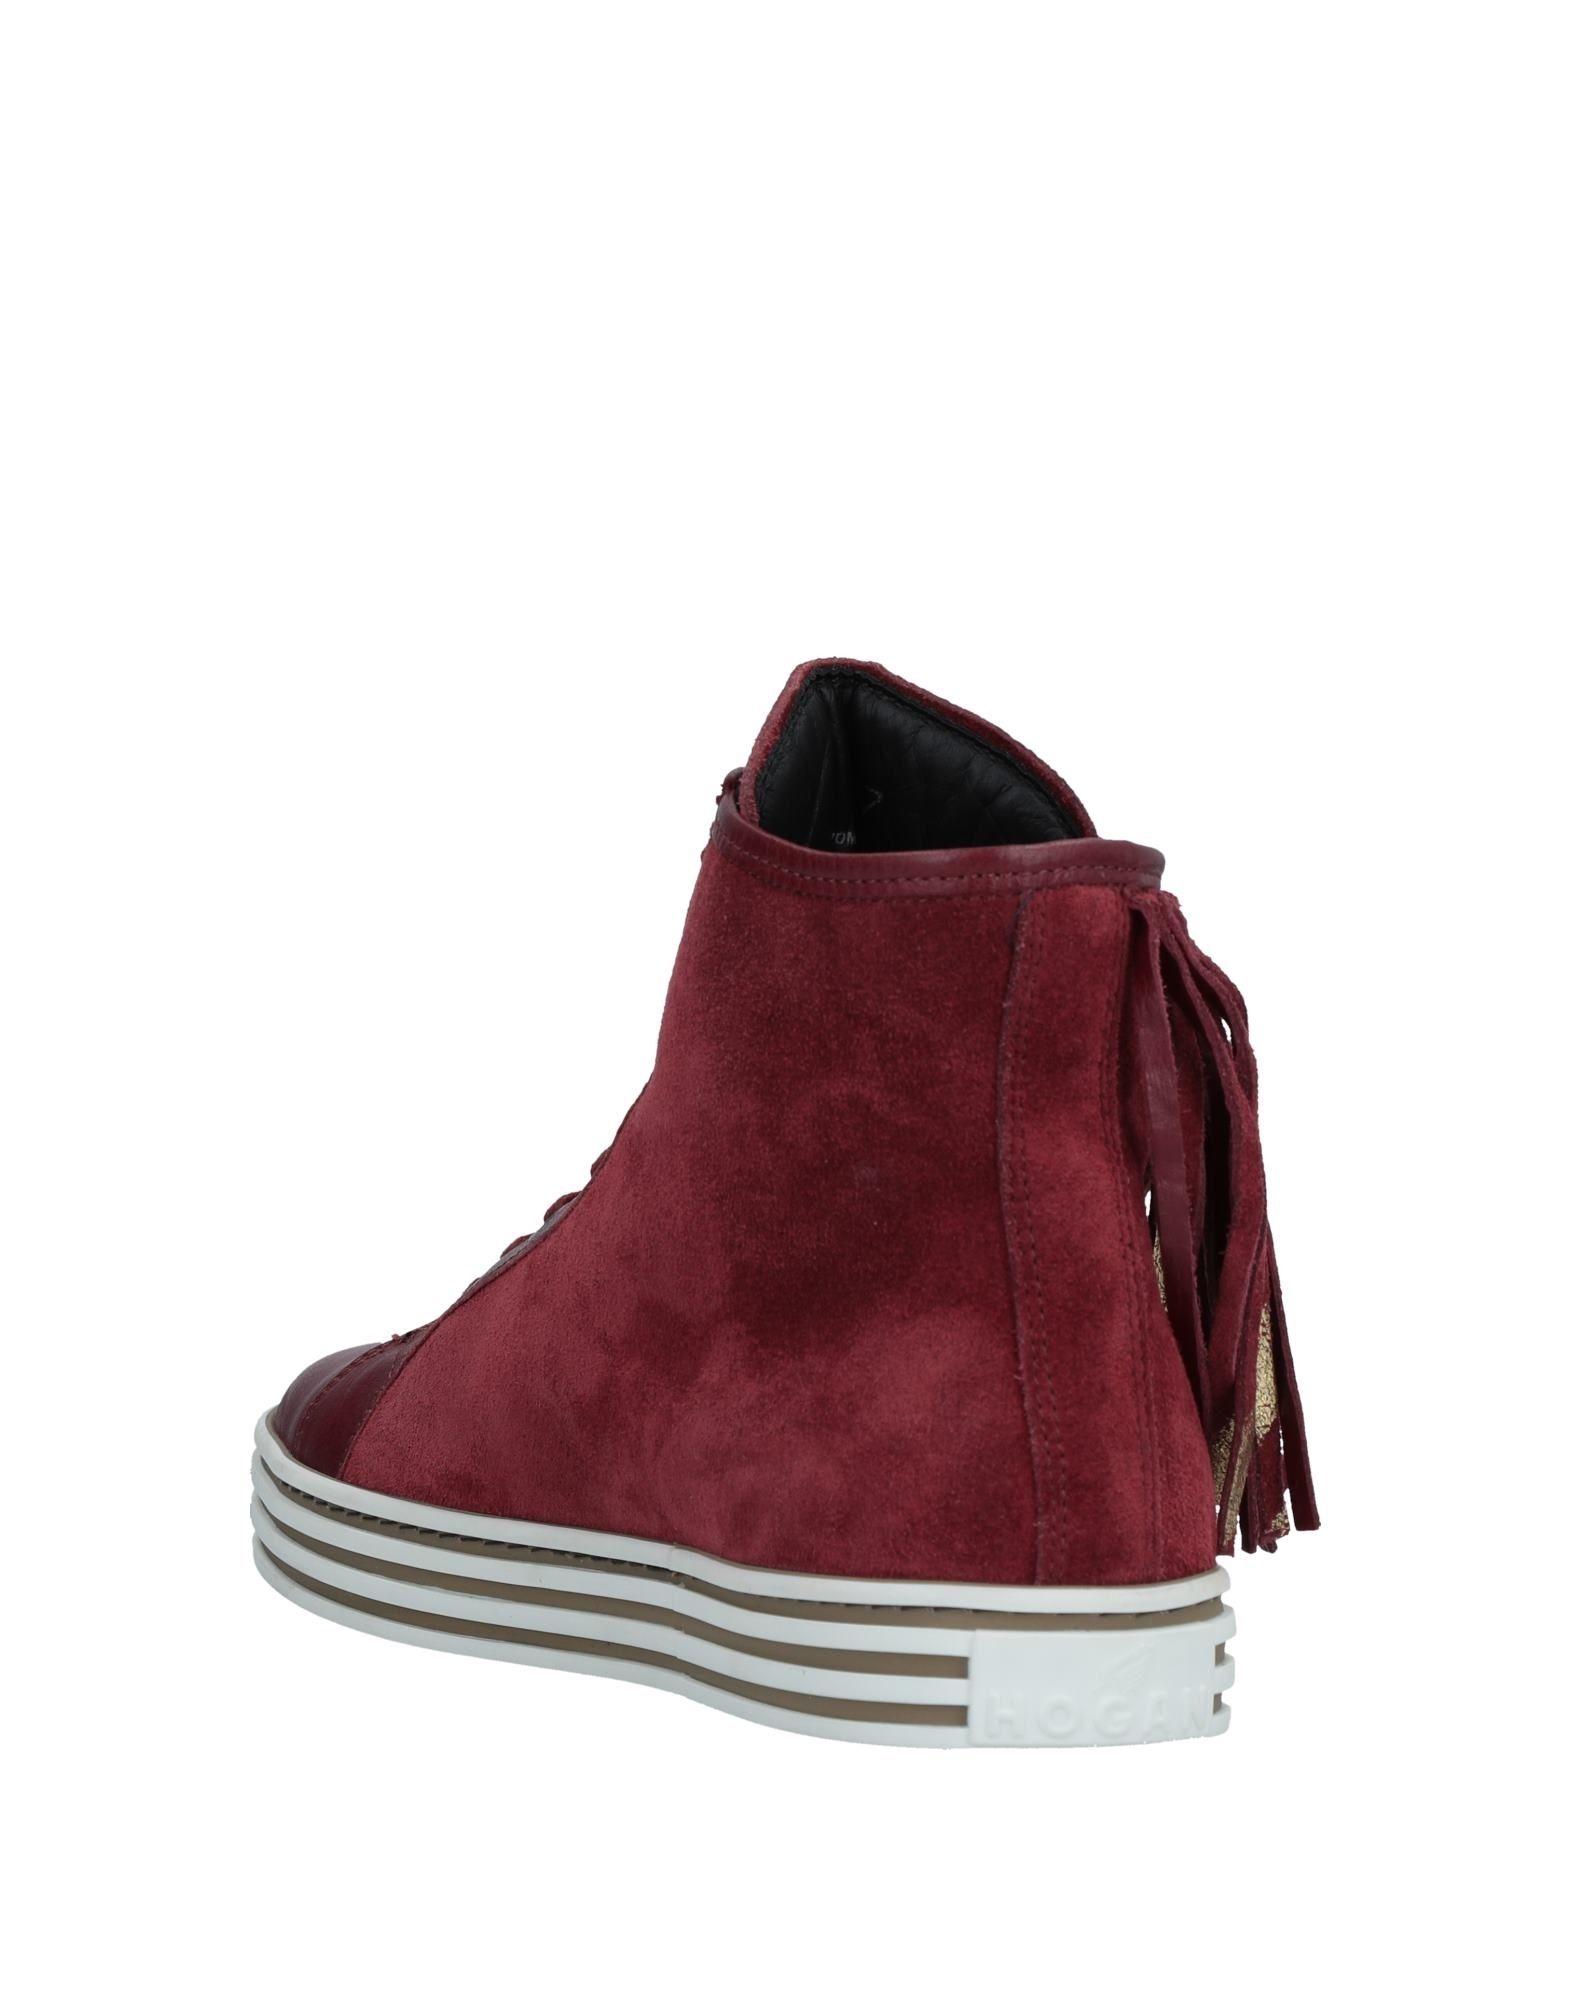 Hogan Sneakers - Women Women Women Hogan Sneakers online on  United Kingdom - 11539287JE efd340